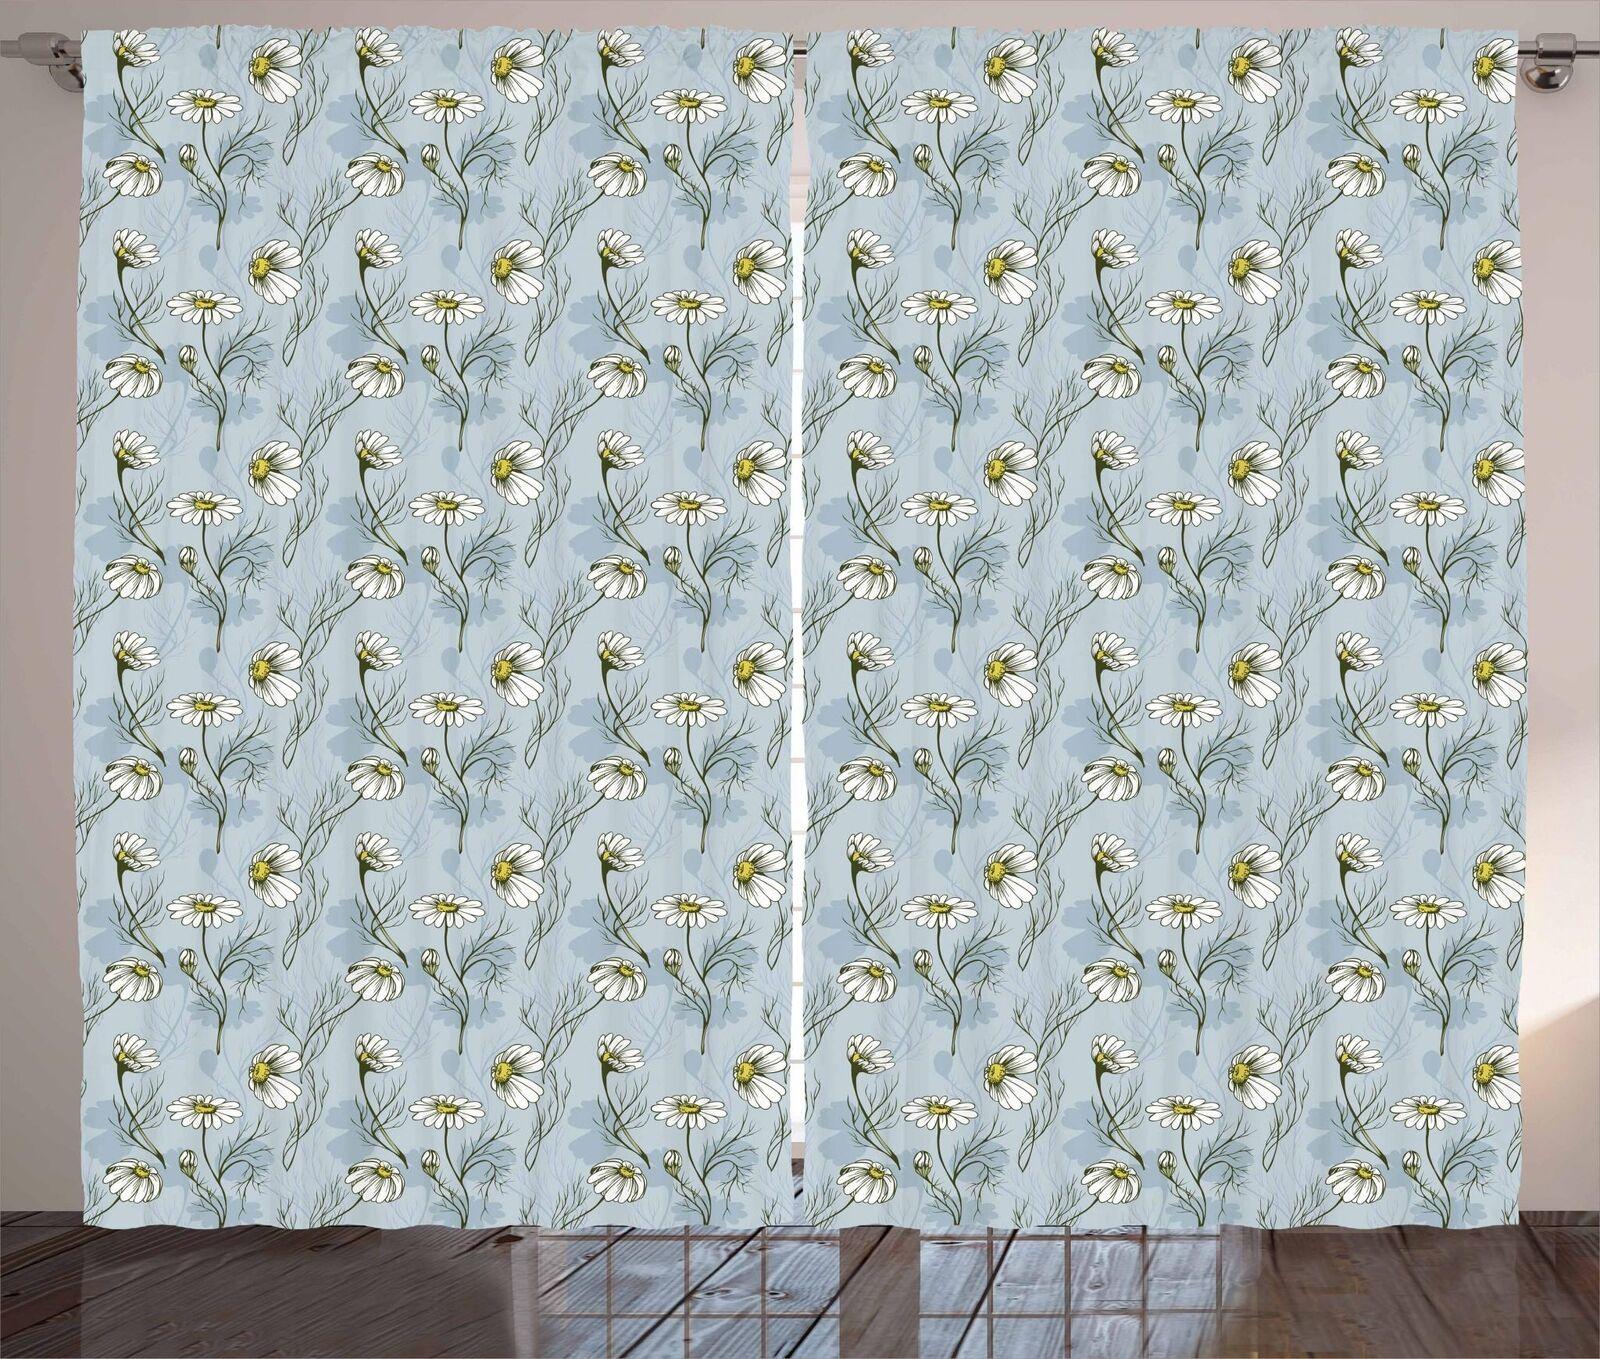 Daisy Curtains 2 Panel Set for Decor 5 Tallas Available Window Drapes